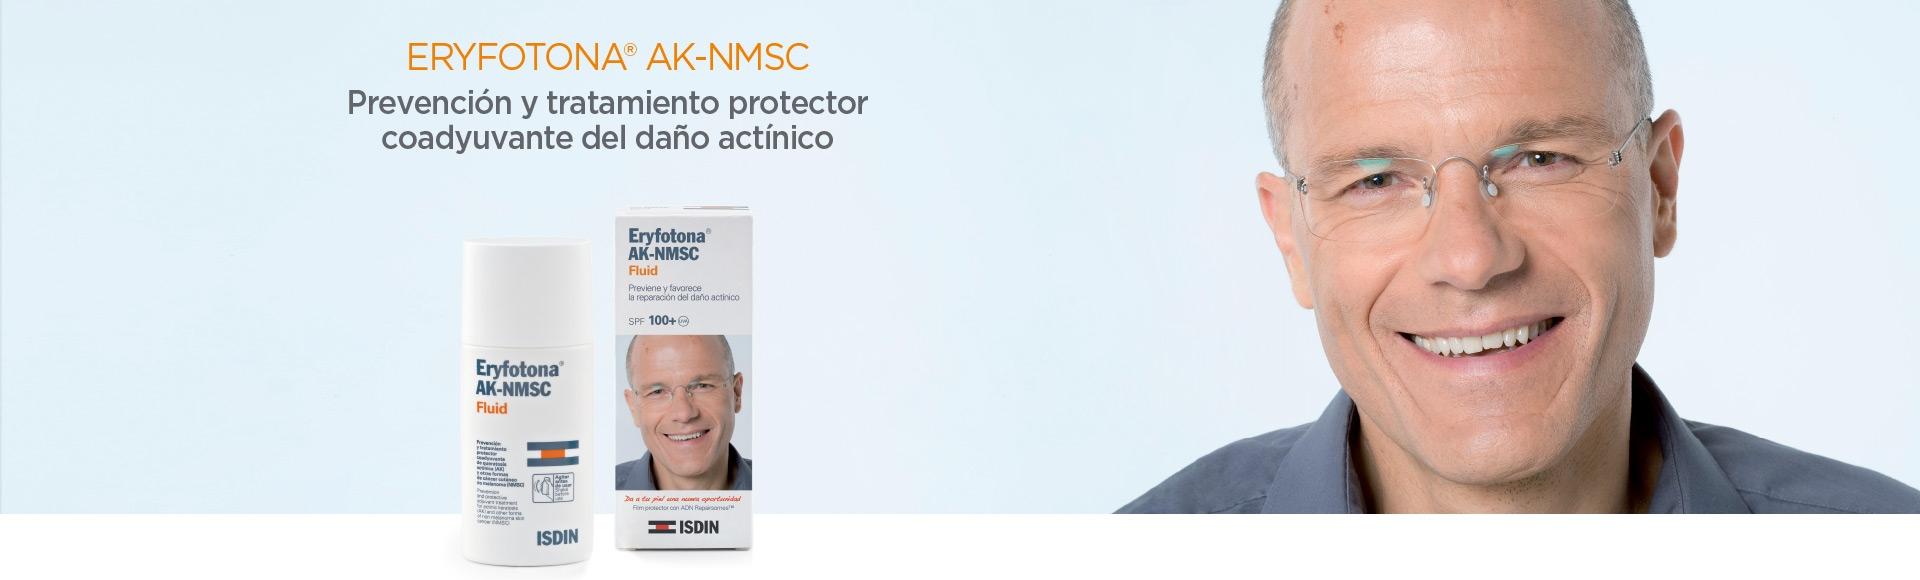 ISDIN Eryfotona AK-NMSC Banner